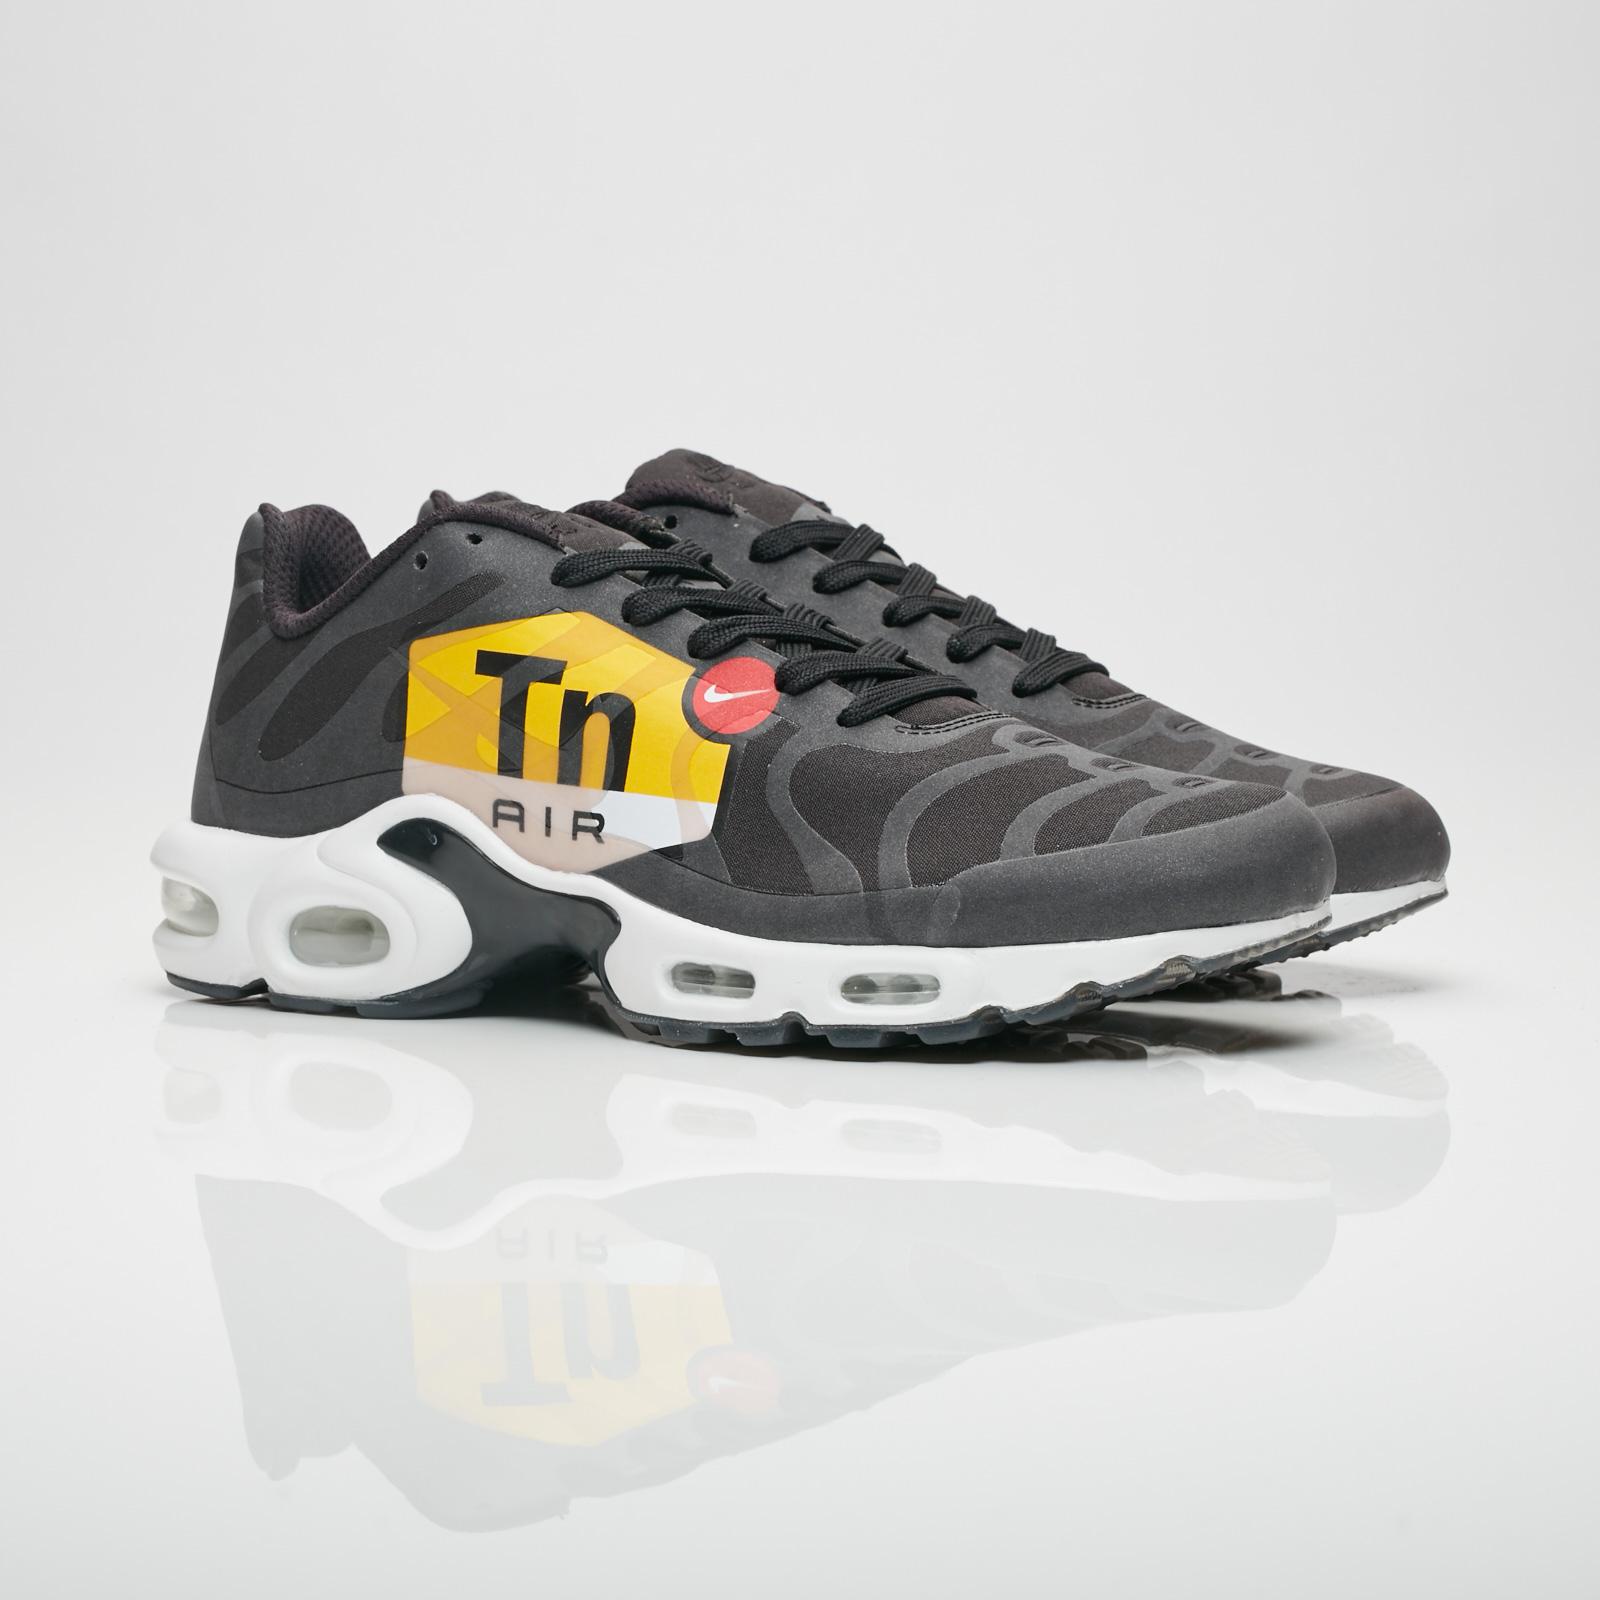 8eb58858bfc Nike Air Max Plus NS GPX - Aj0877-001 - Sneakersnstuff